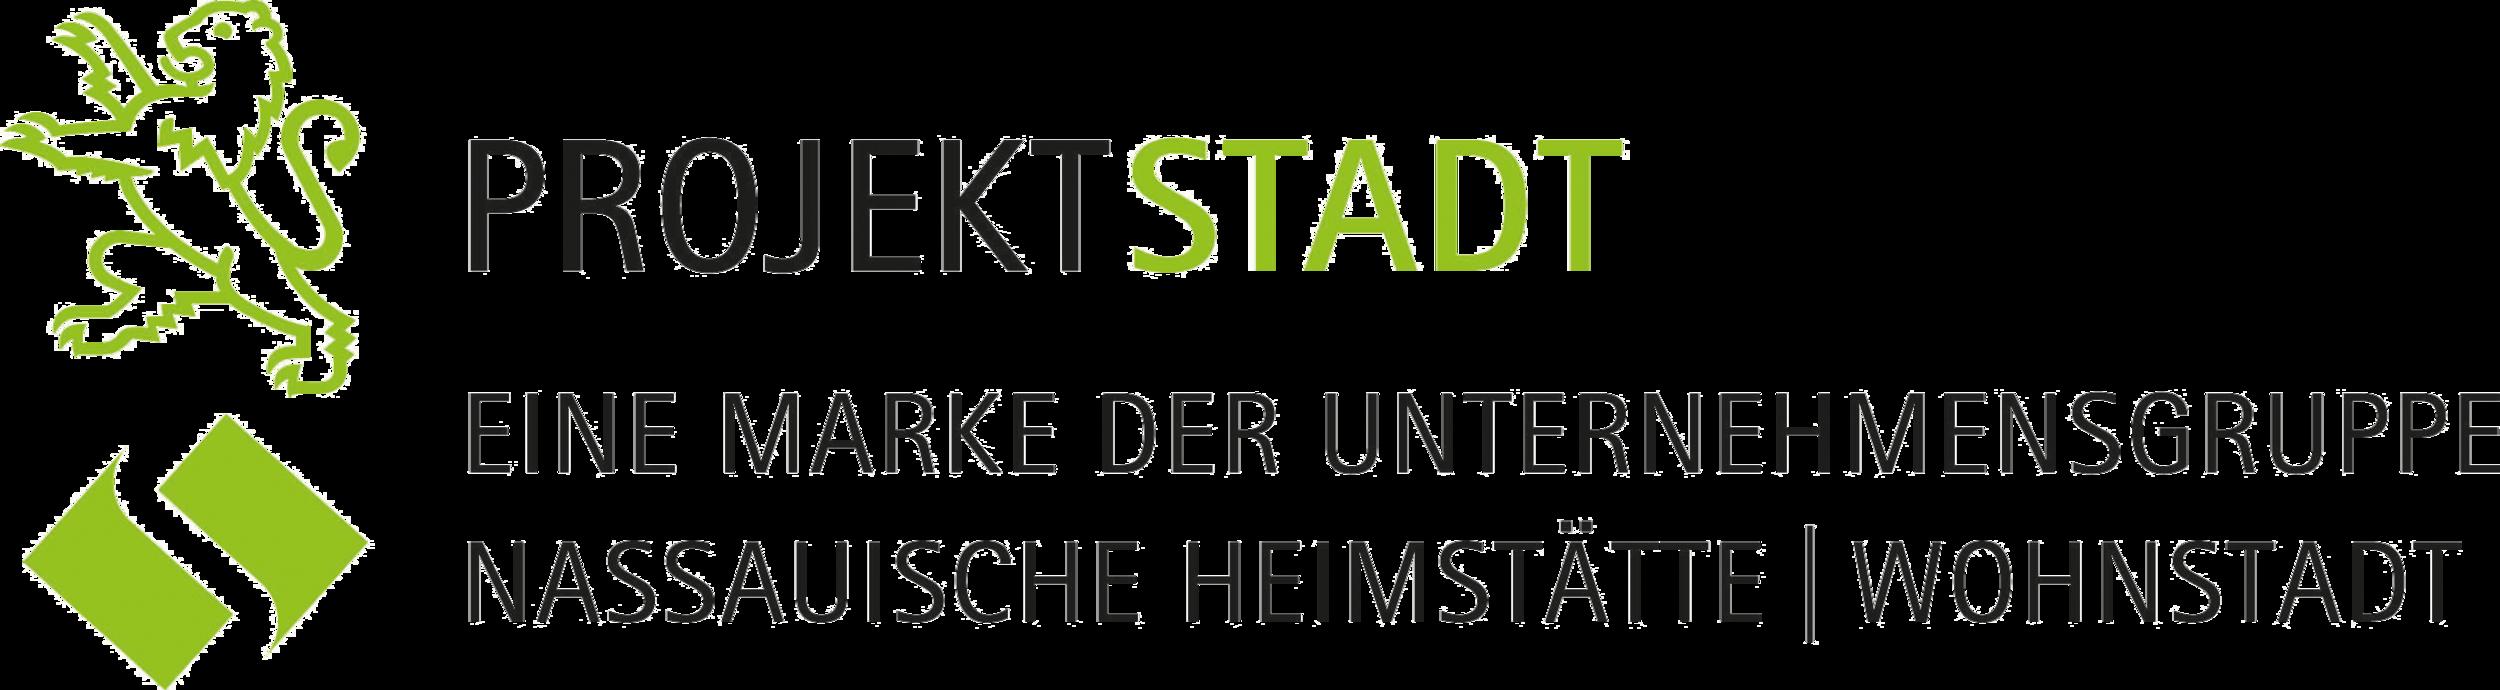 PS_Logo%20rgb.png